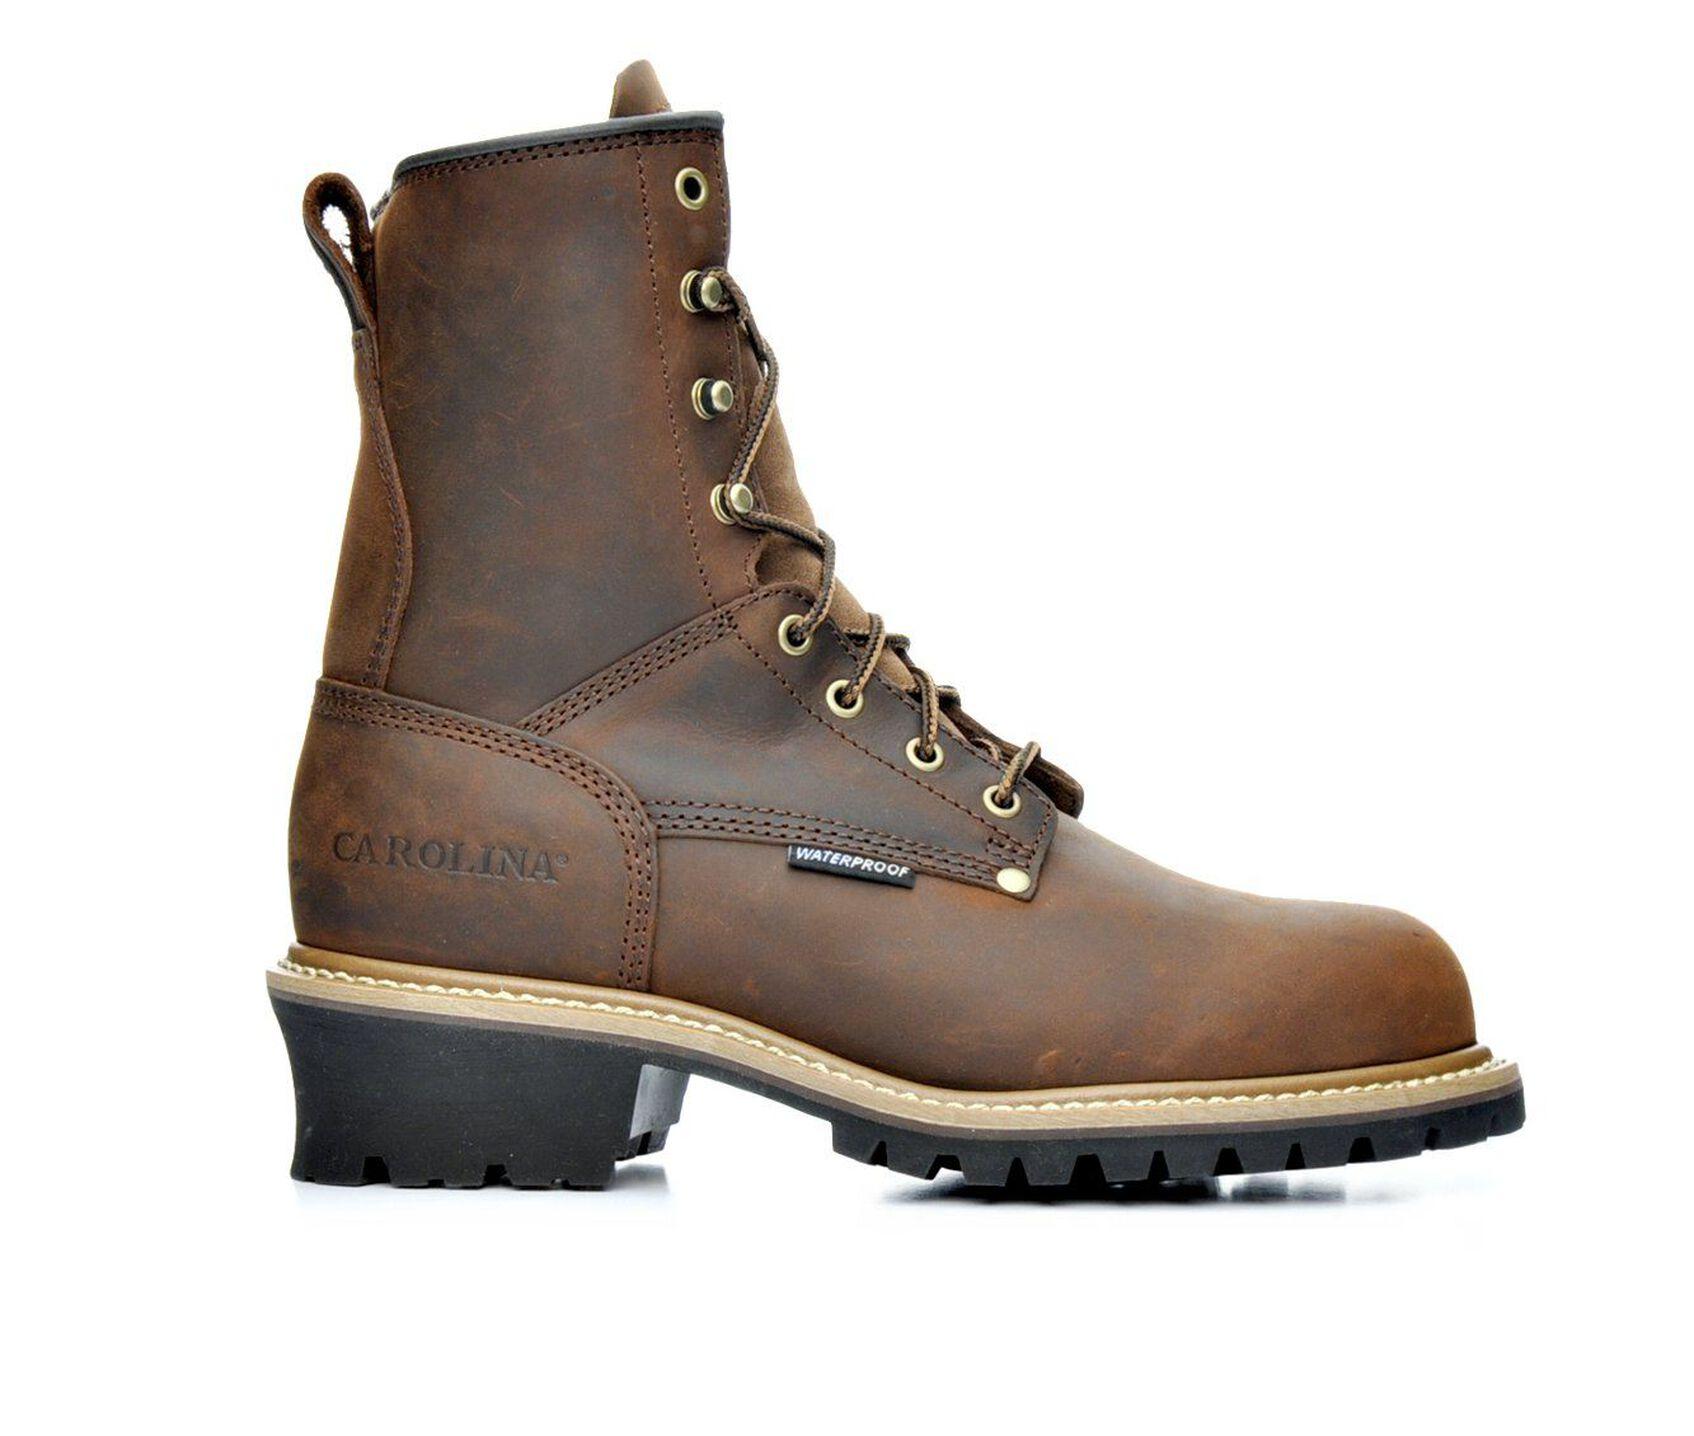 22a25c4c720 Men's Carolina Boots CA9821 8 In Steel Toe Waterproof Logging Work Boots